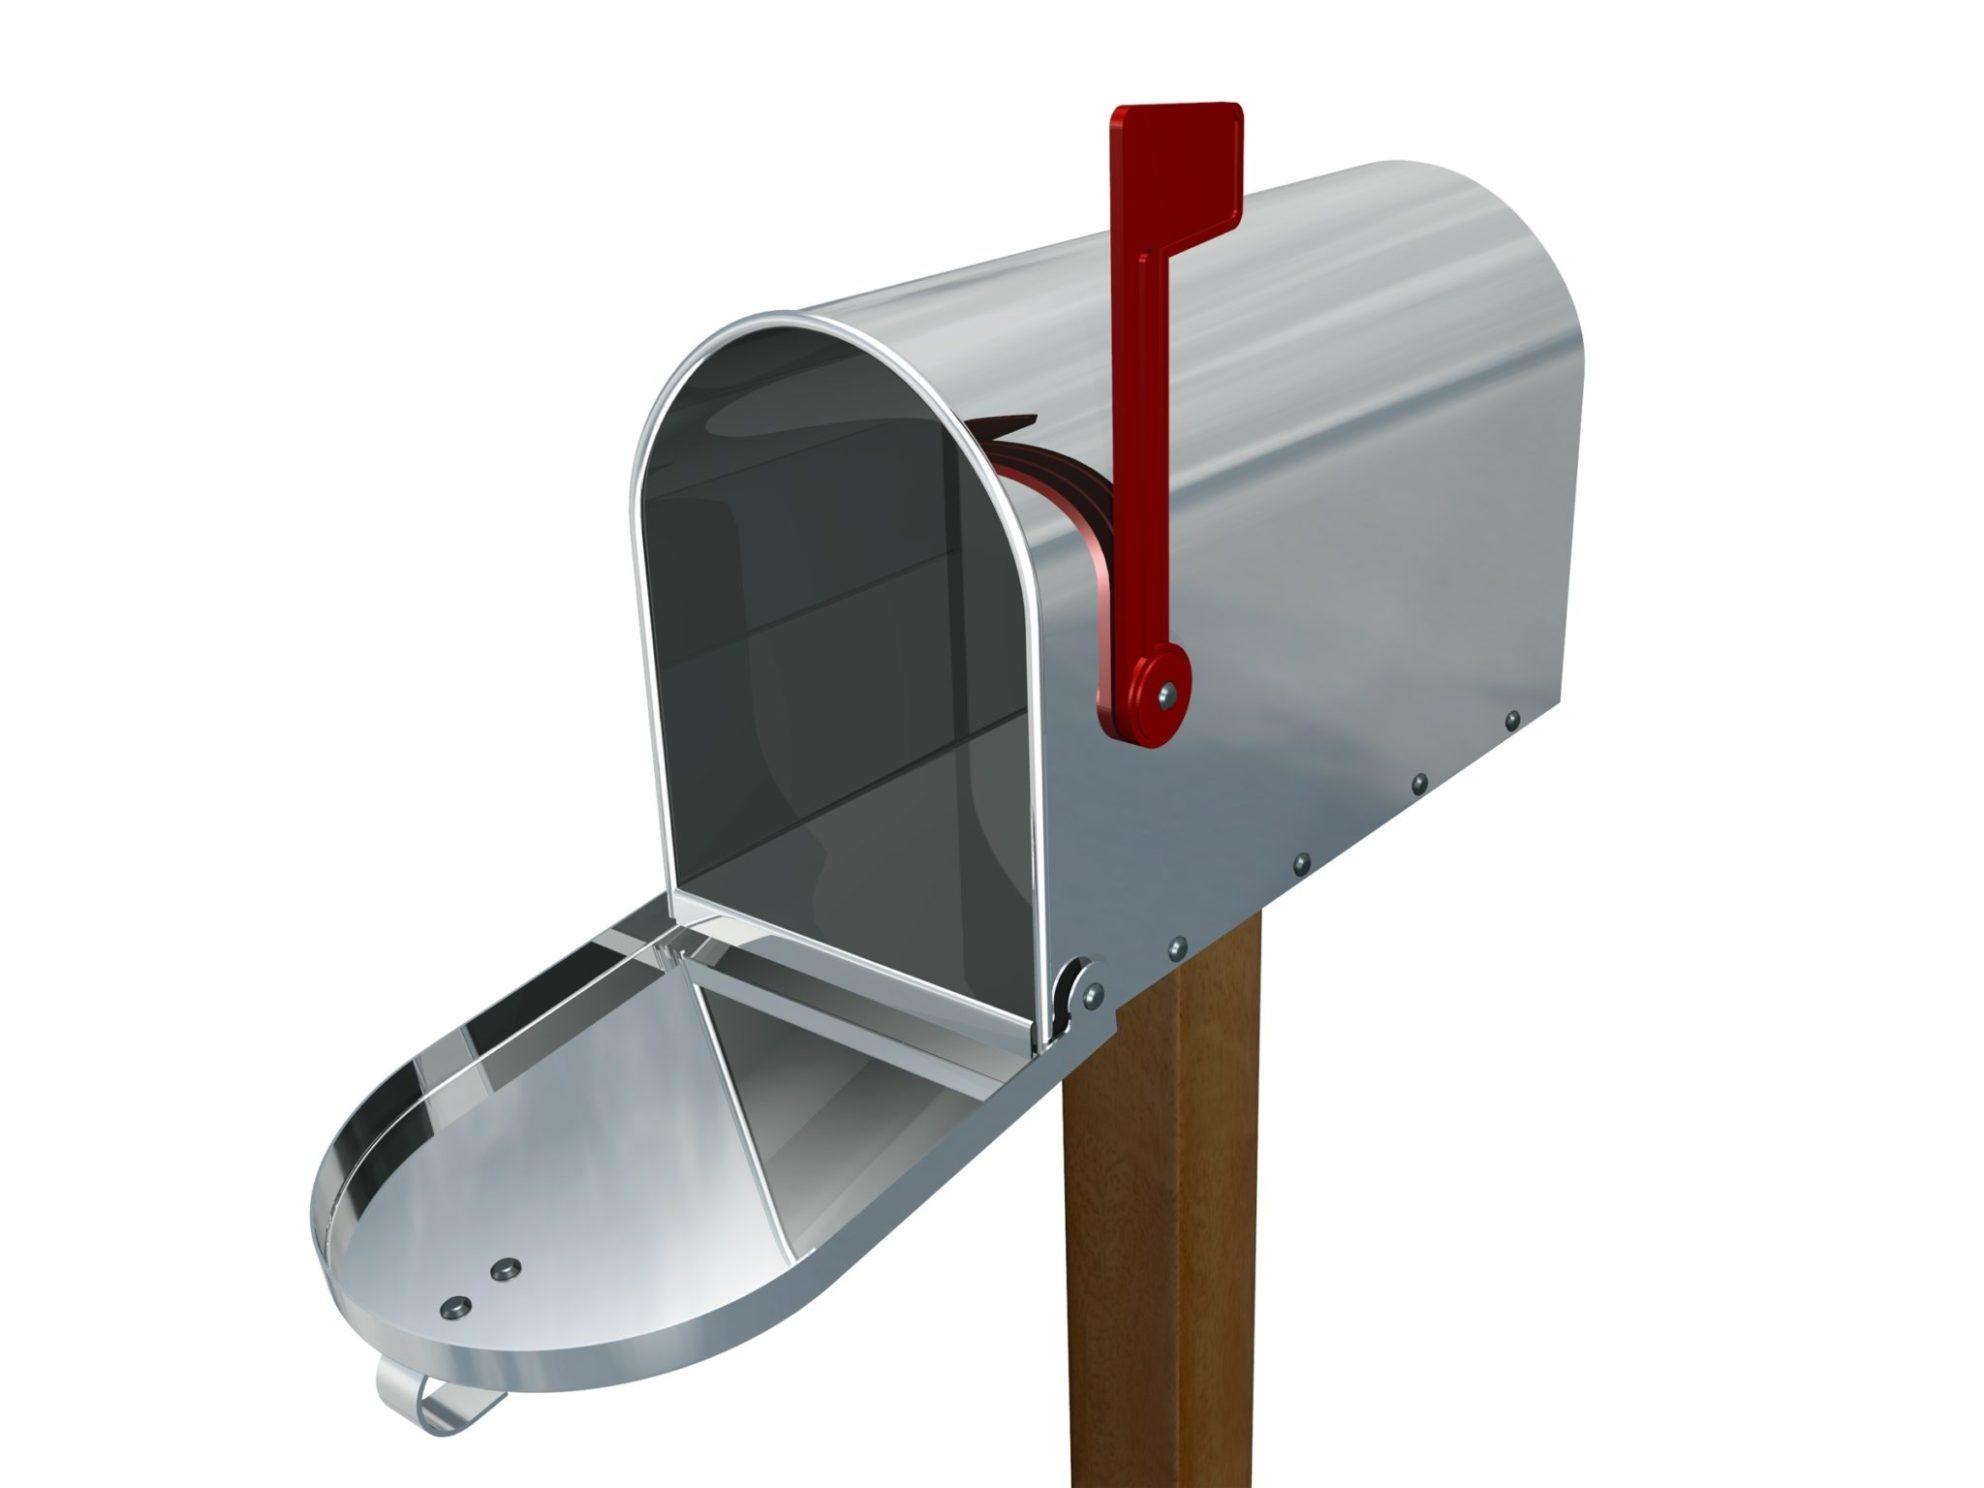 Reorganize your email and achieve 'inbox zero'